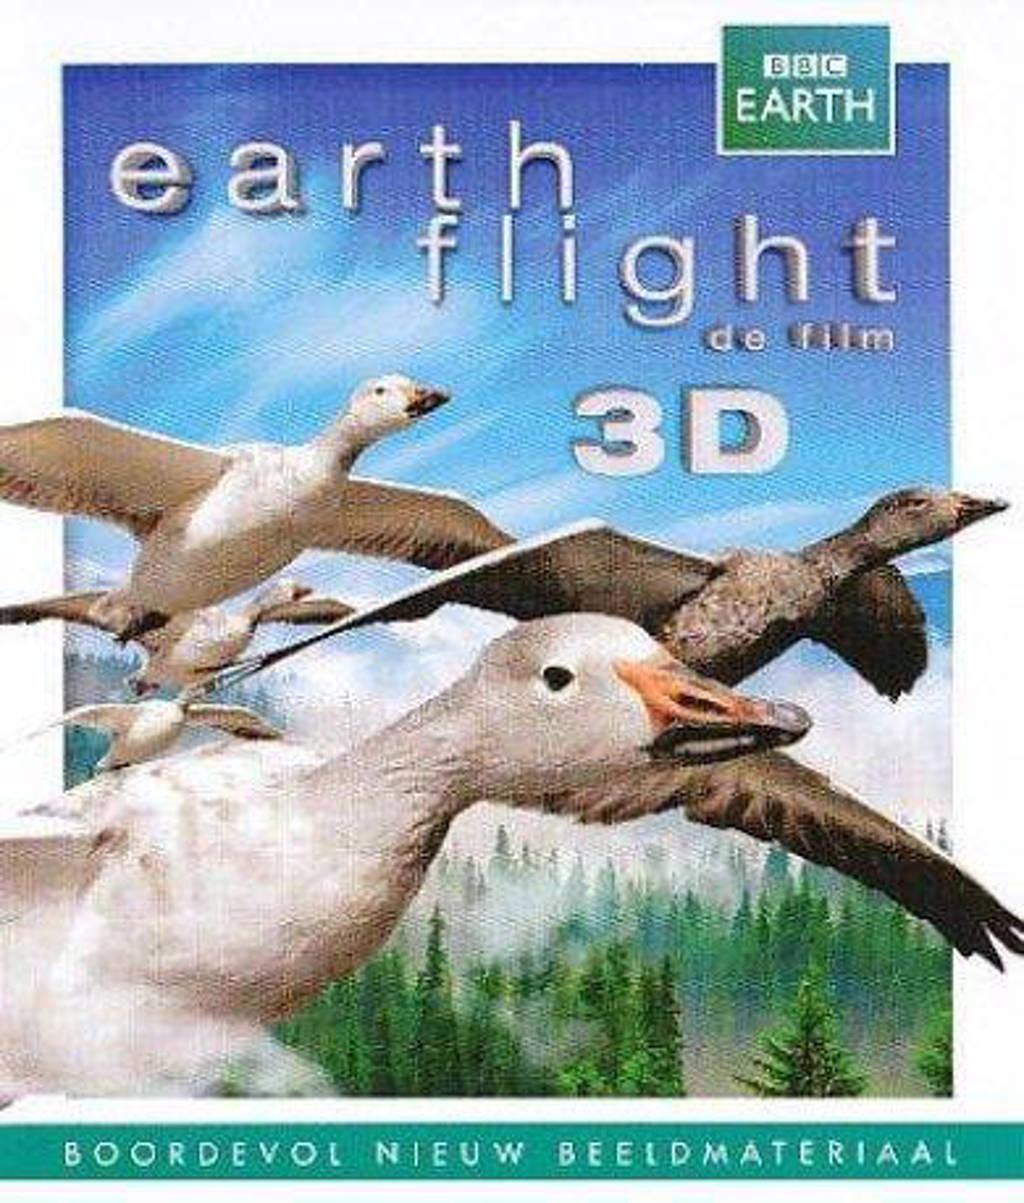 BBC earth - Earth flight (3D) (Blu-ray)